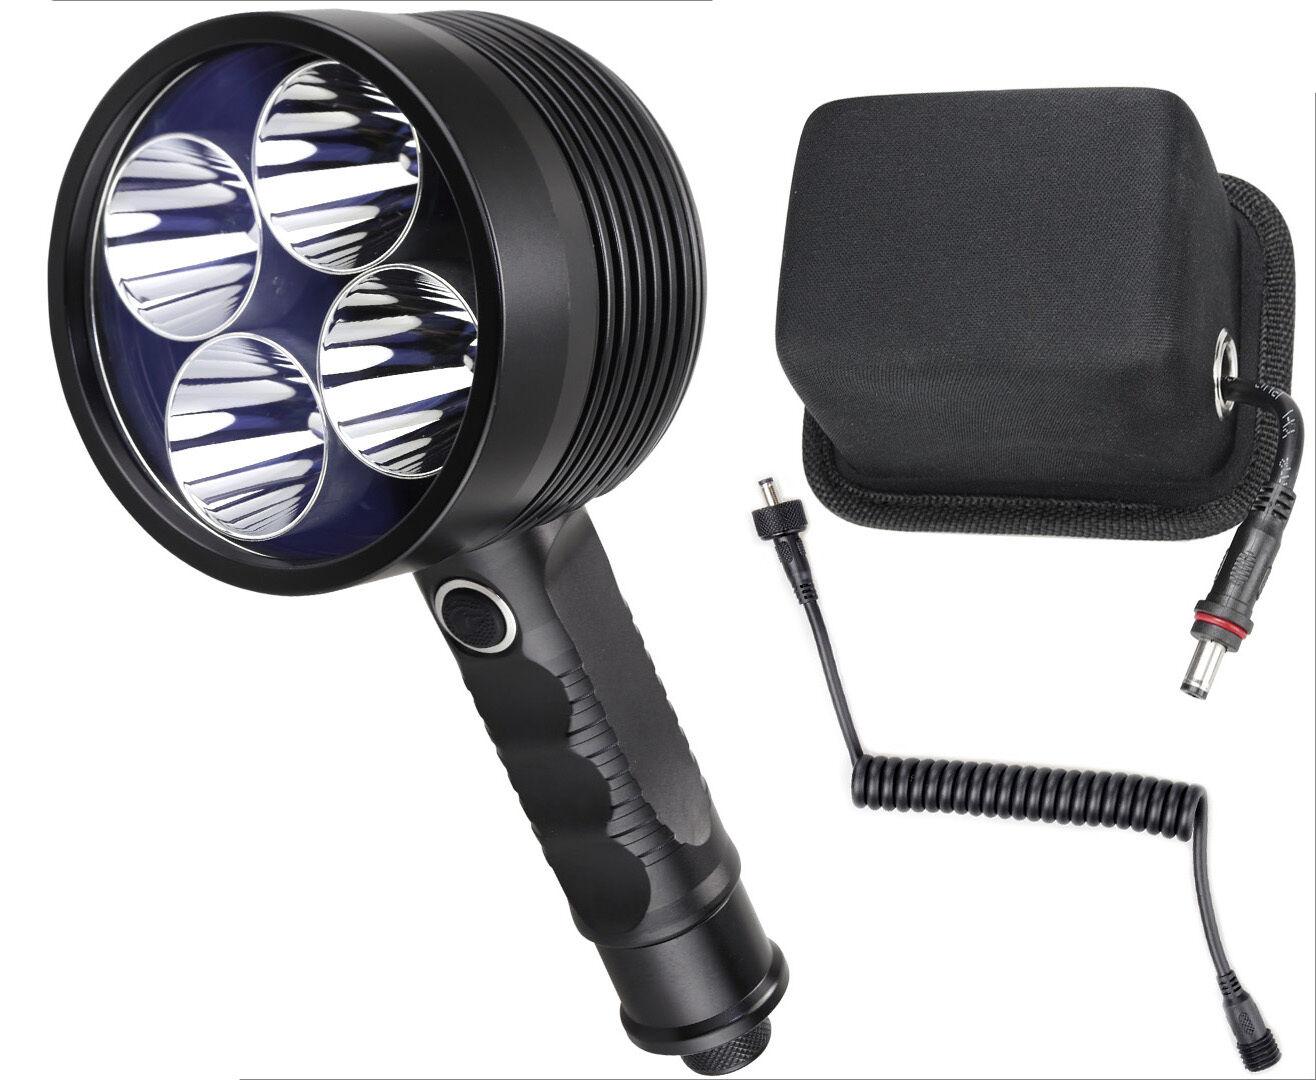 Sportac ZP10L9 Battery Pack Edition 5120 Lumens XP-L Hi LED